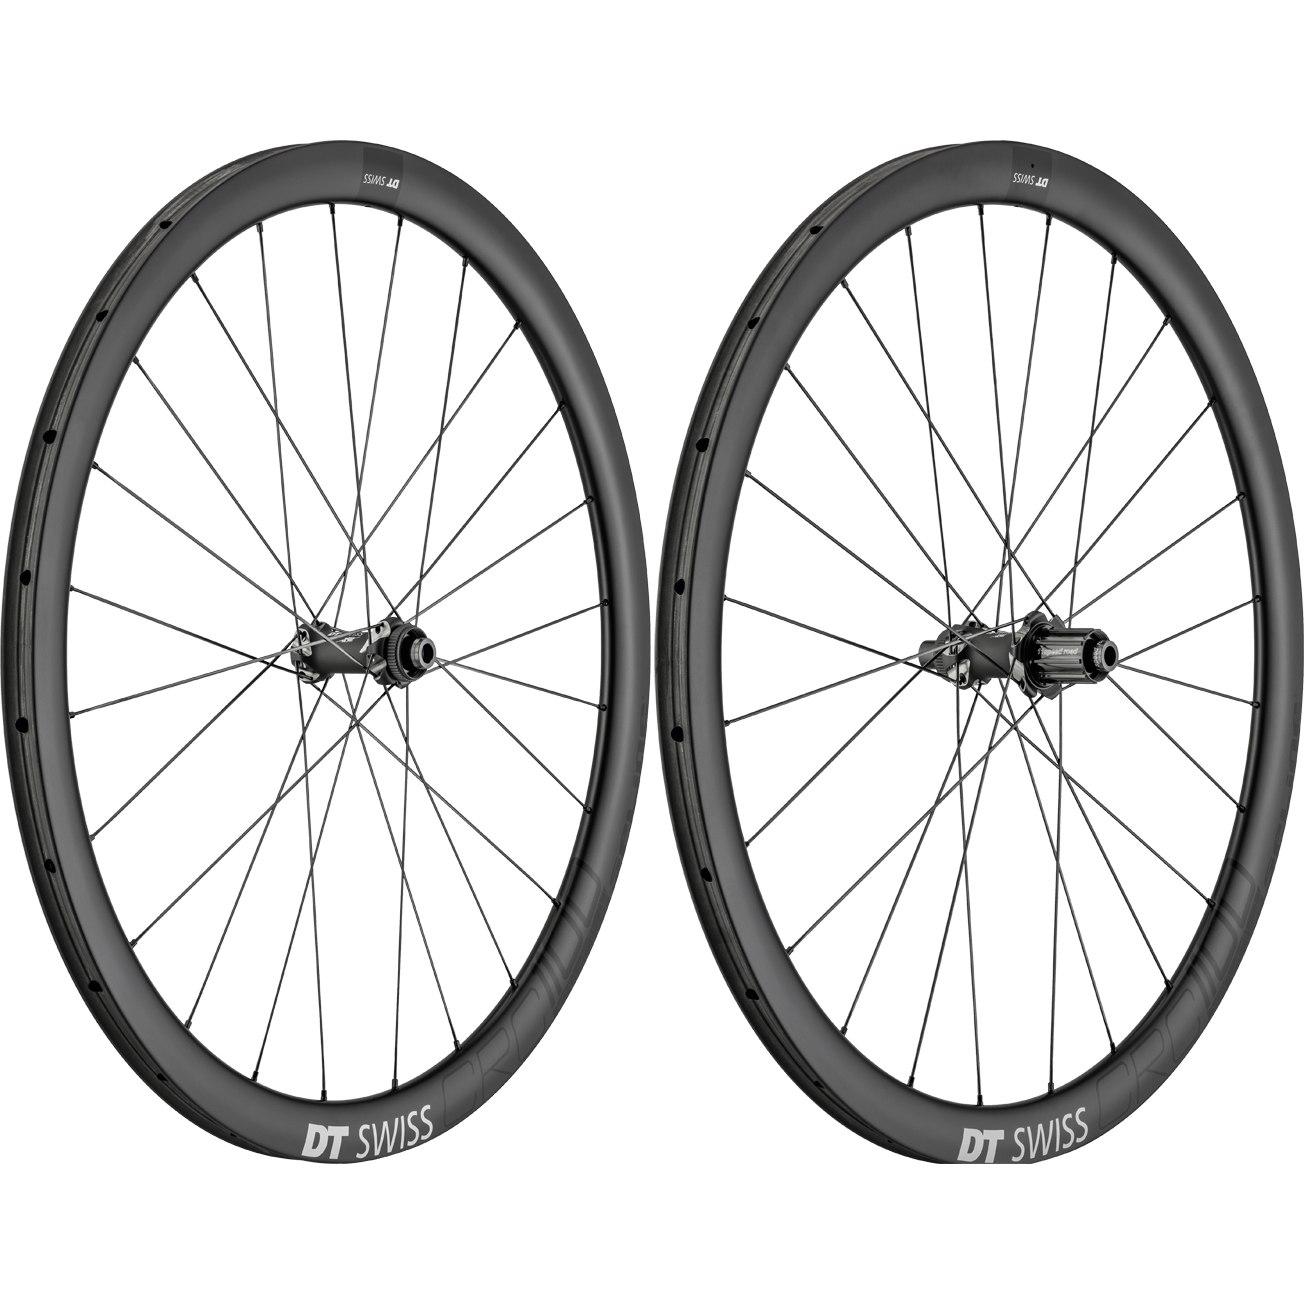 DT Swiss CRC 1100 SPLINE T db 38 - Carbon - Wheelset - Tubular - Centerlock - FW: 12/15x100mm/QR | RW: 12x142mm/QR